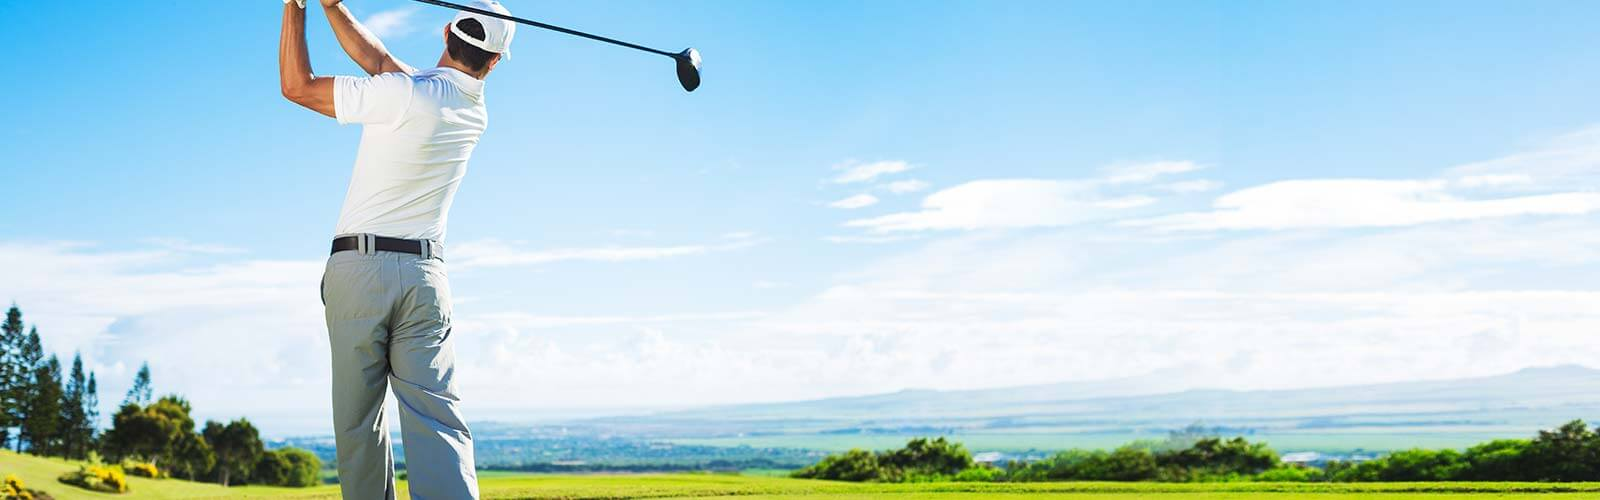 Chiron-golf